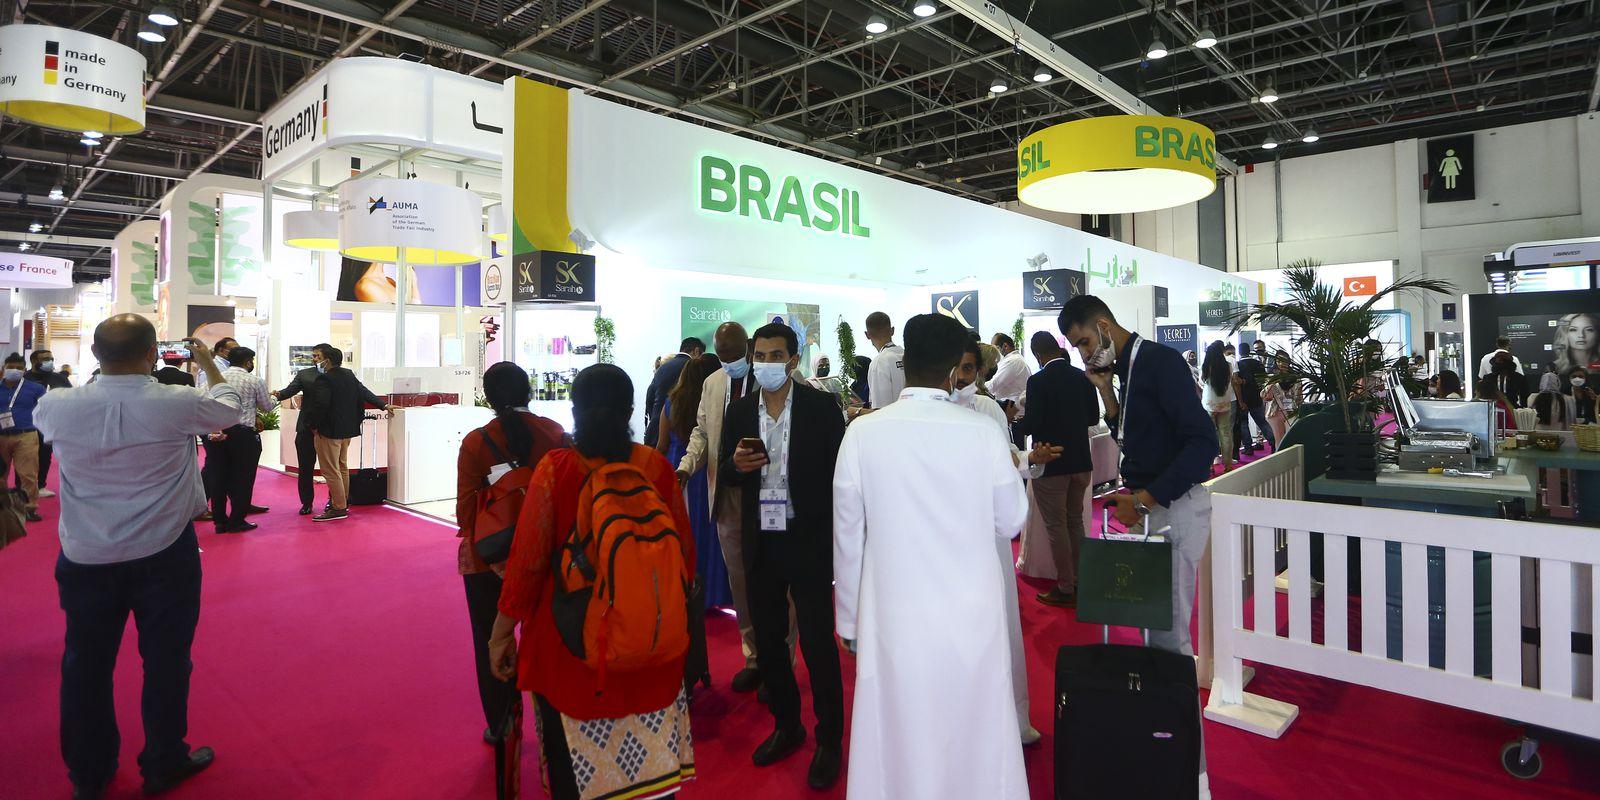 Estandes de empresas brasileiras na Beauty World Middle East, maior feira de produtos cosméticos do oriente médio.